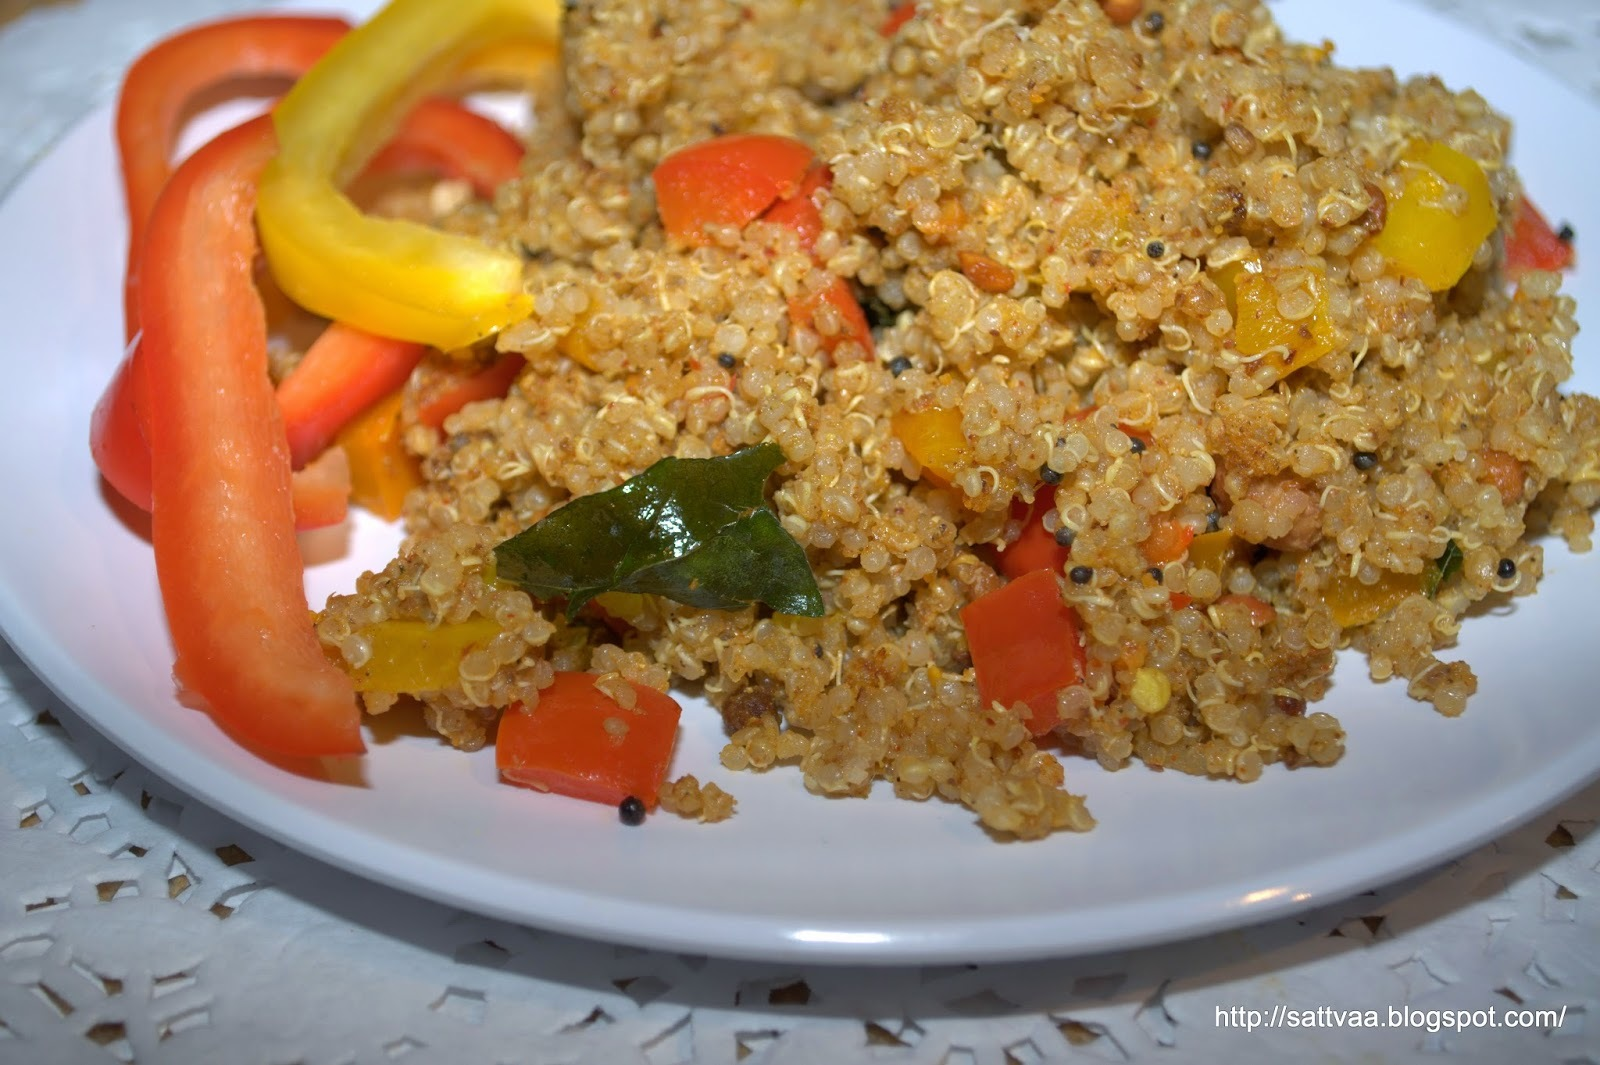 vah re vah quinoa